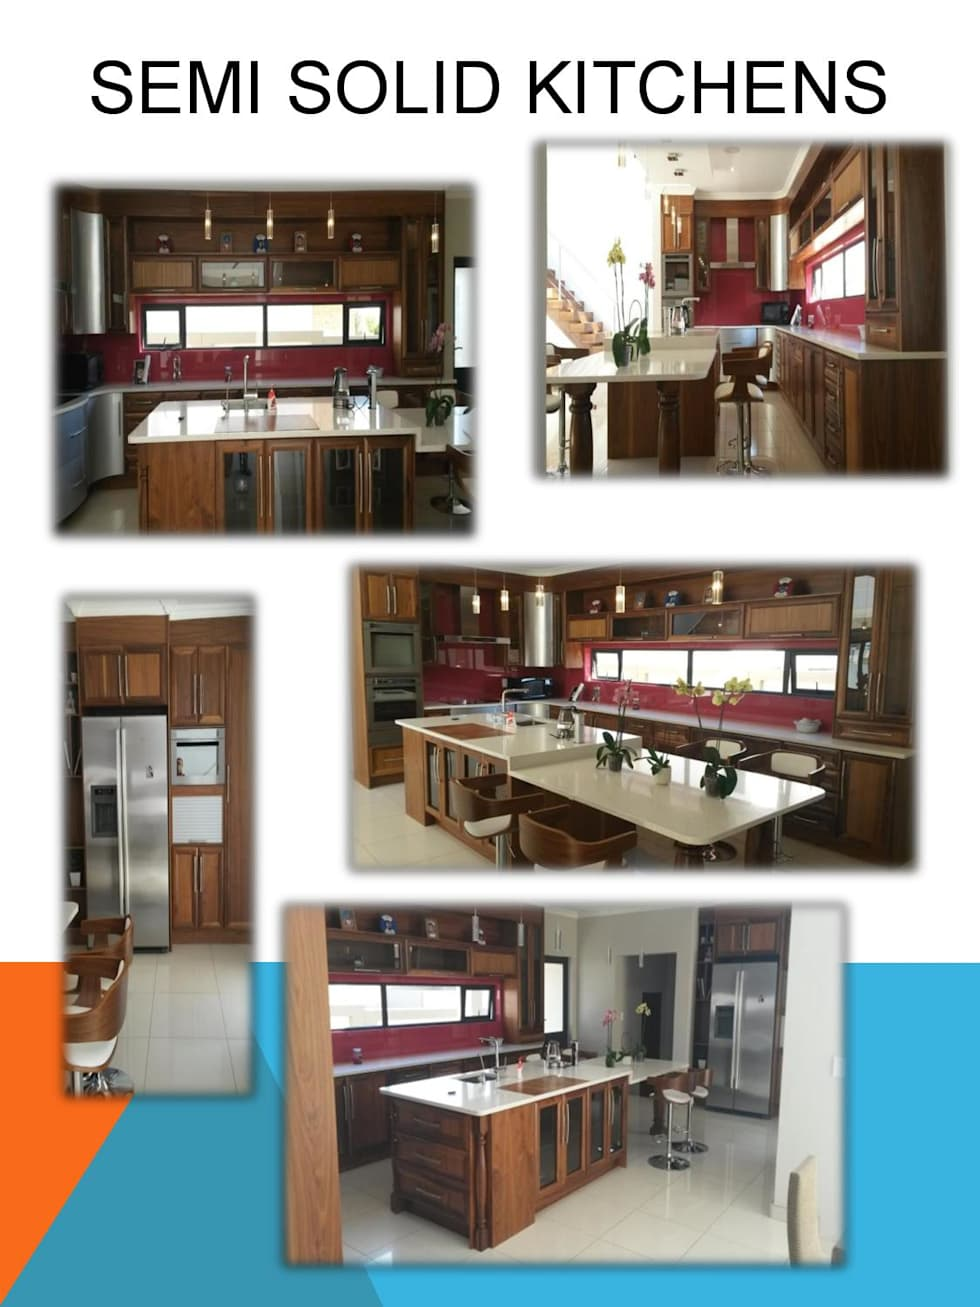 Semi solid kitchen:  Kitchen units by SCD Kitchens